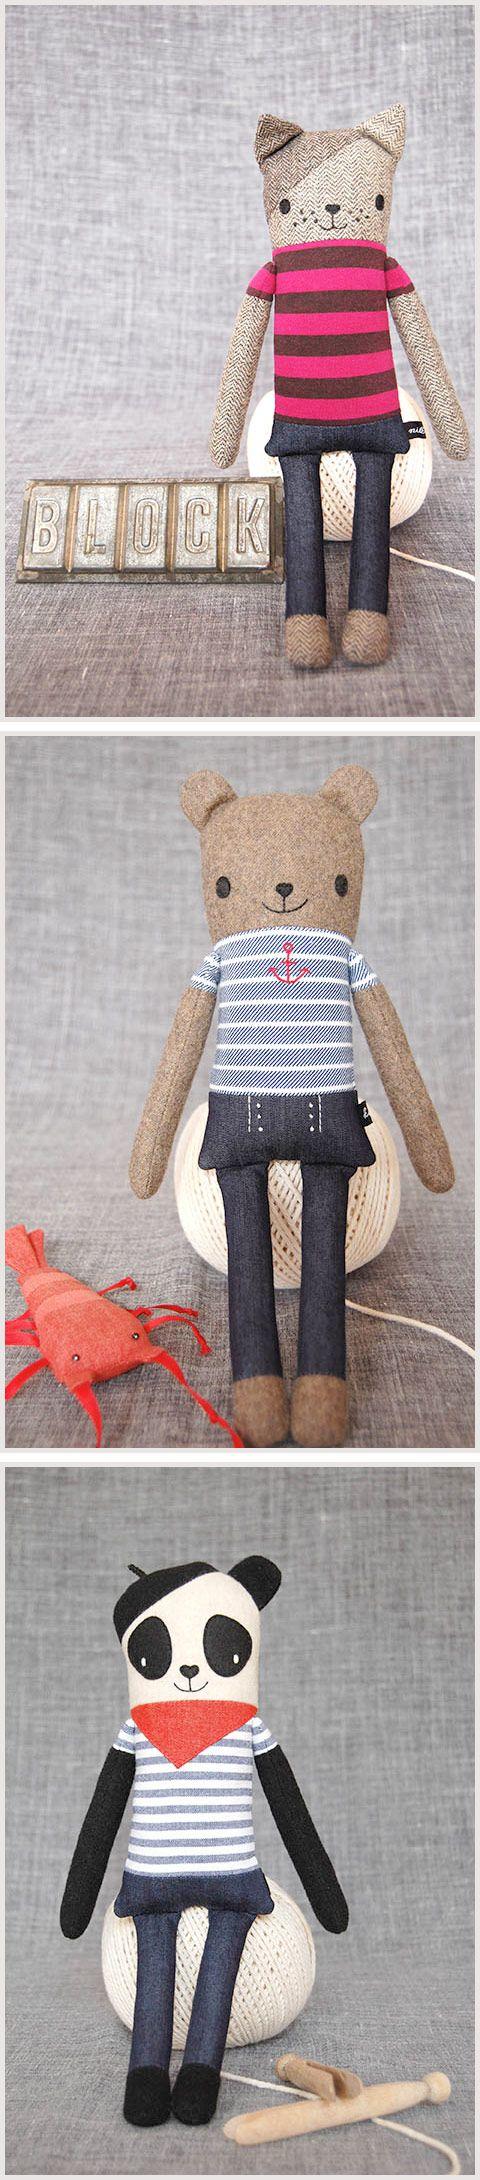 Cute handmade softies. Great Christmas gift ideas | kid independent